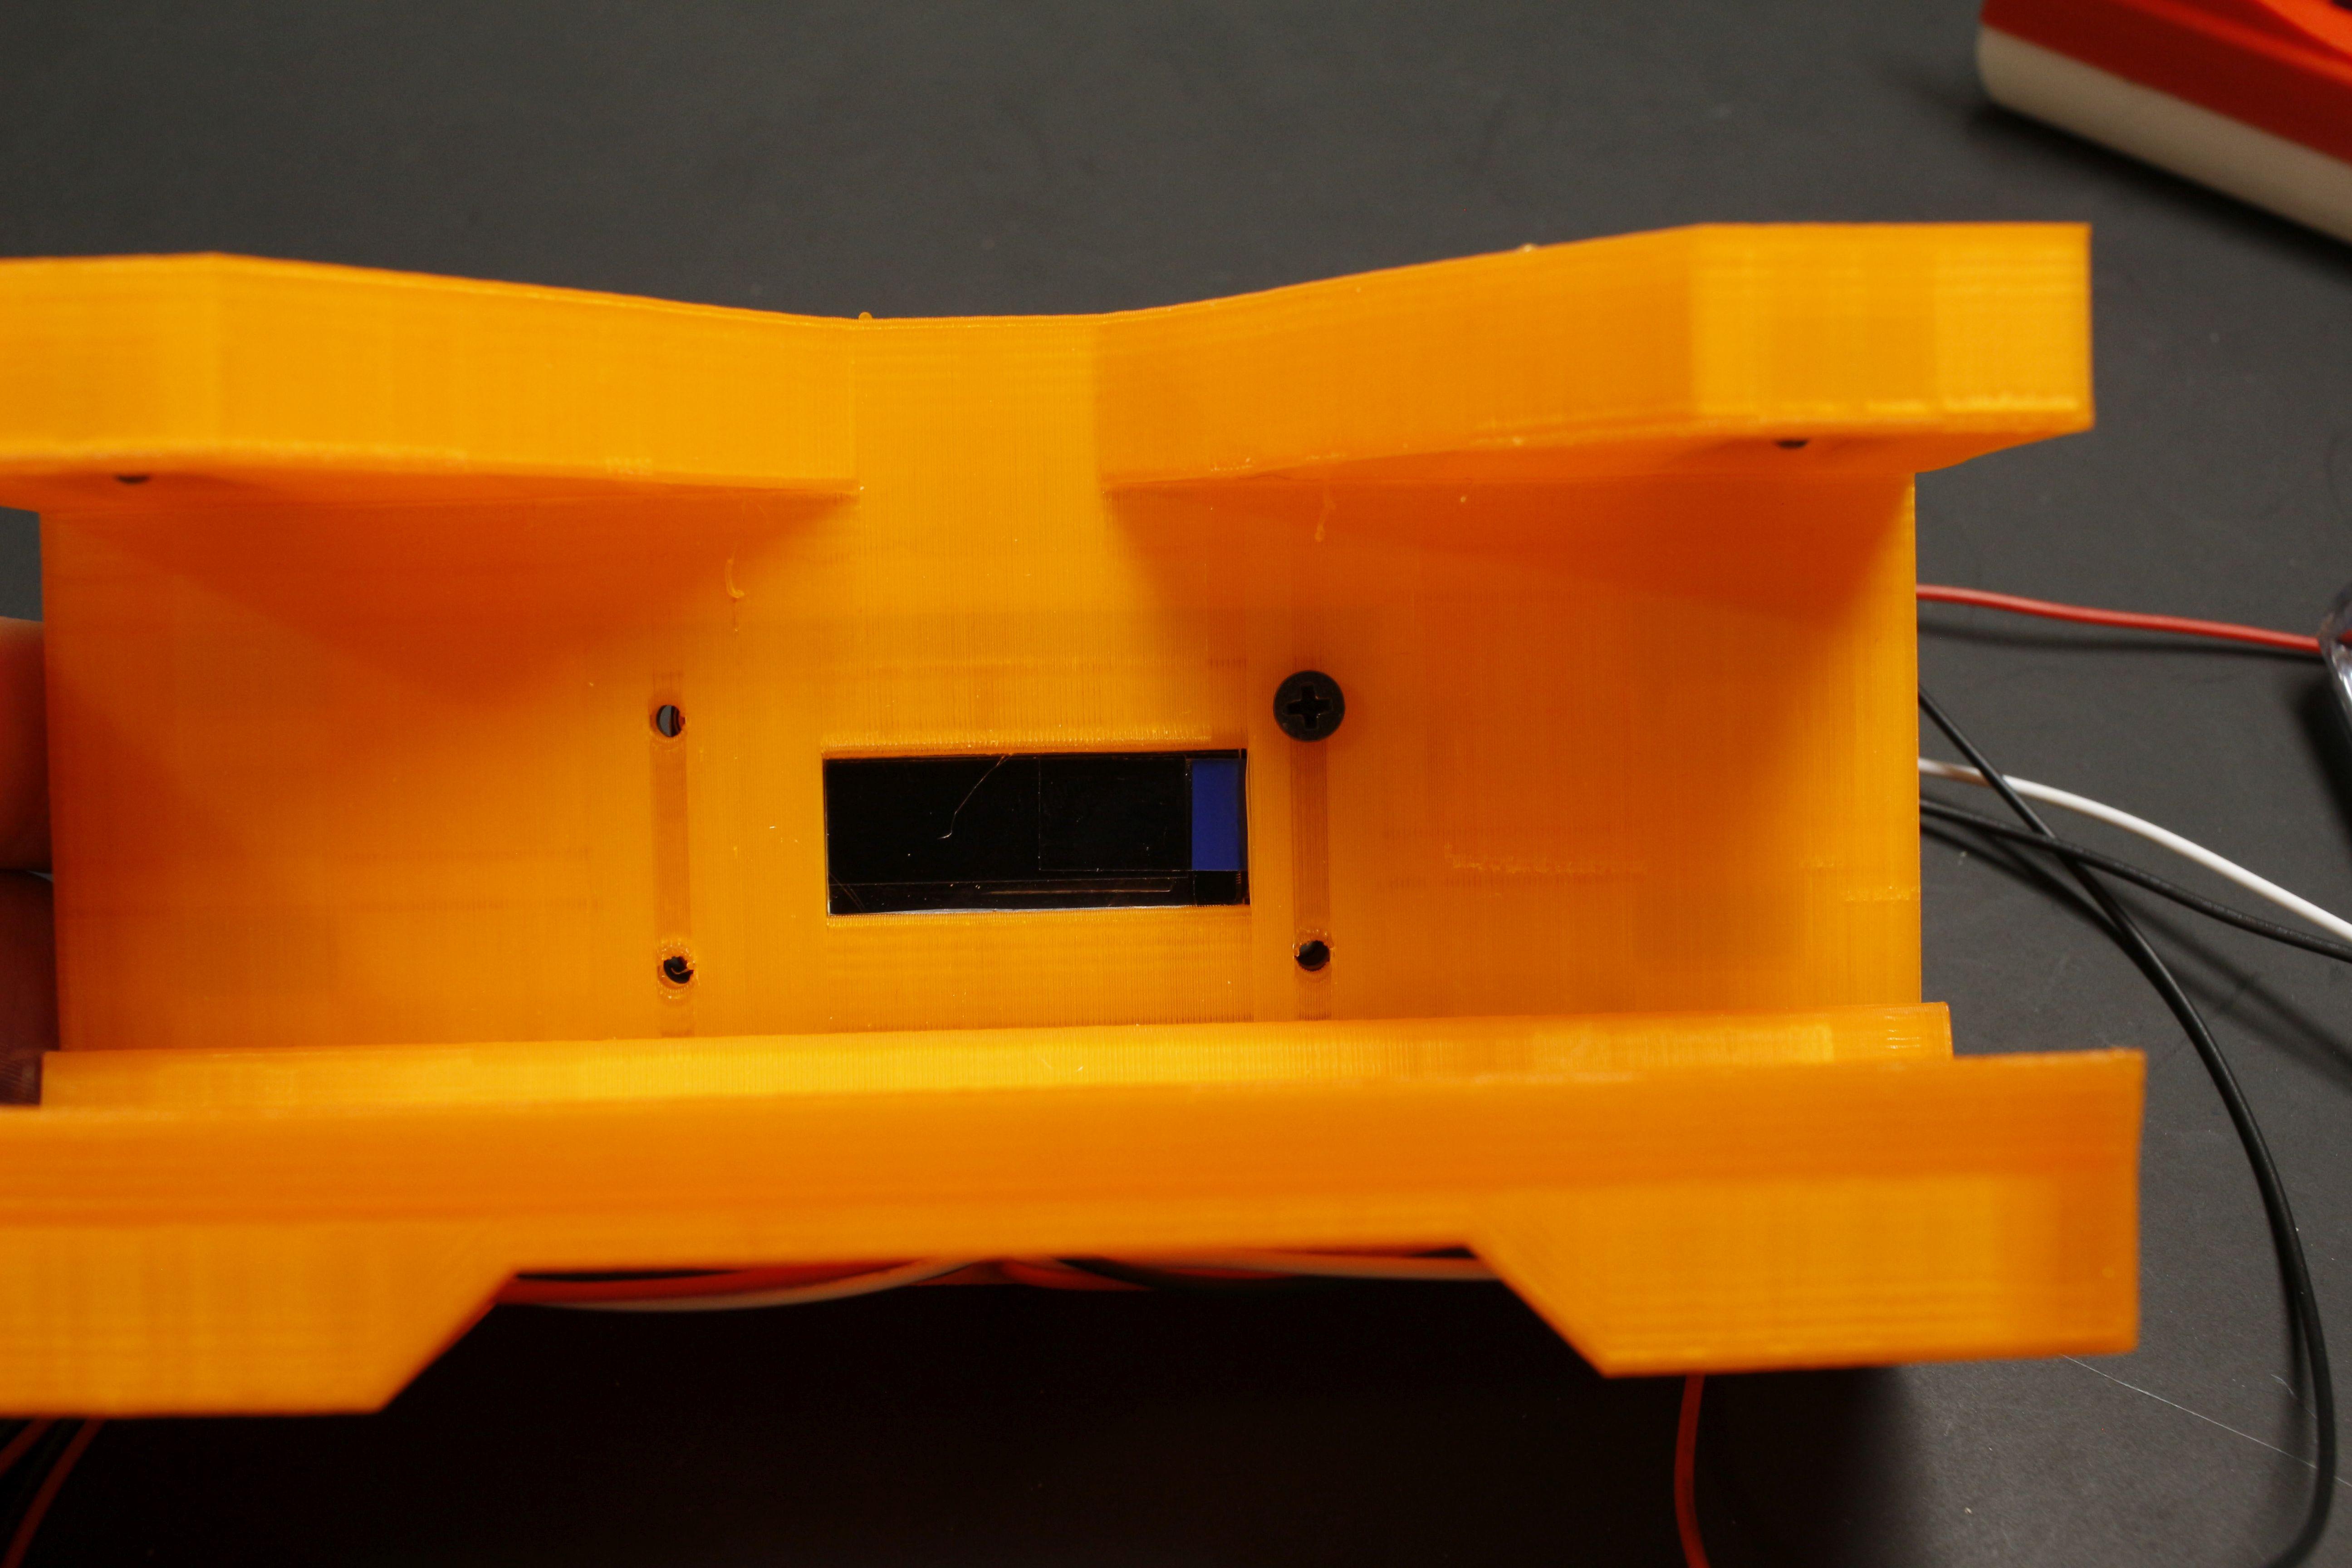 sensors__MG_9680.jpg